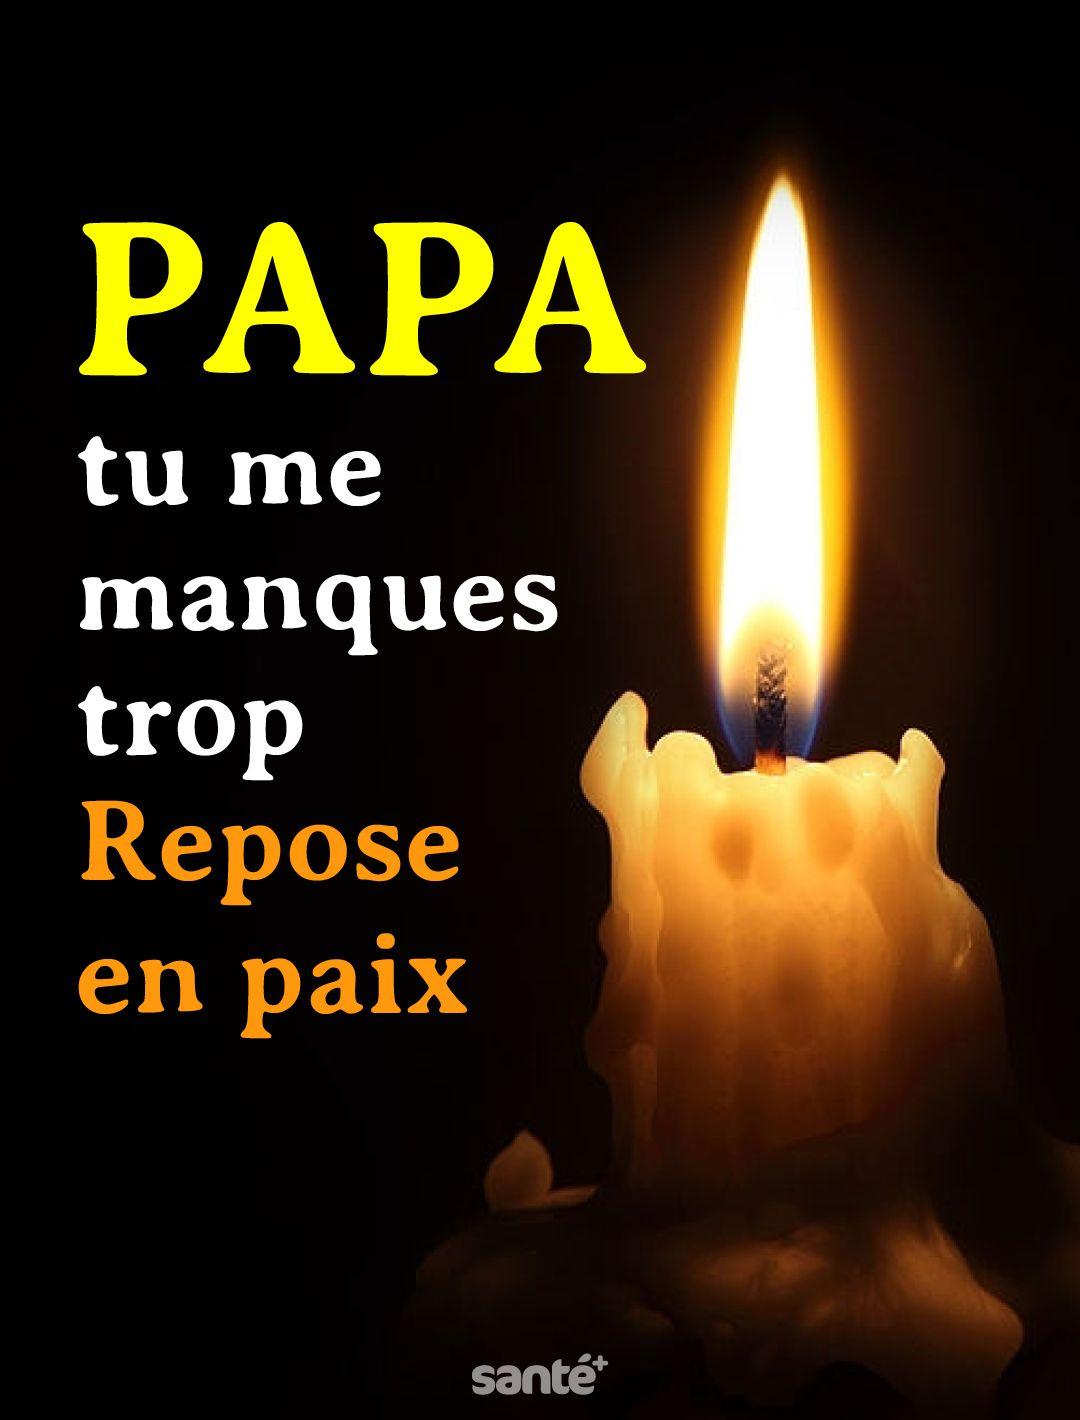 qu'il repose en paix - English translation - Linguee